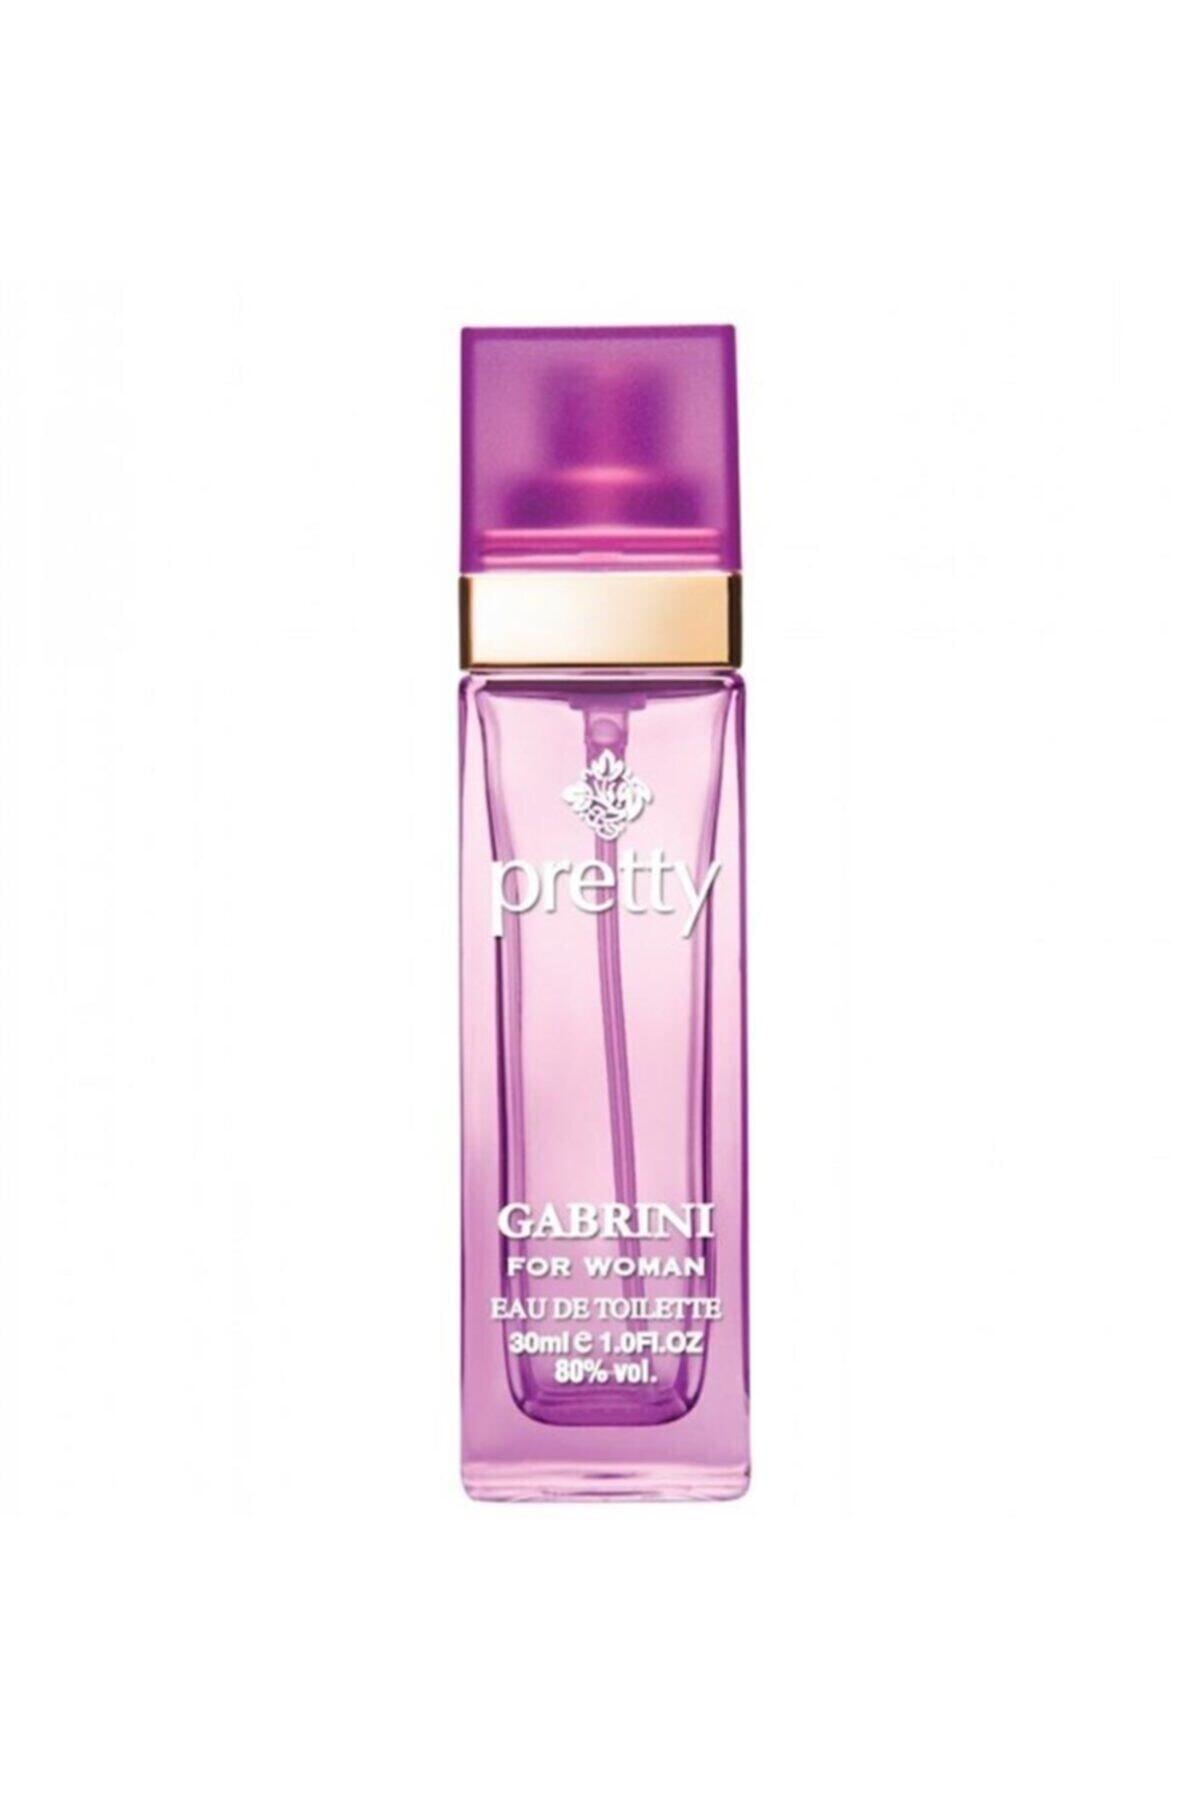 Gabrini Pretty Kadın Parfümü Edt 30 ml No:3 8696814064530 2